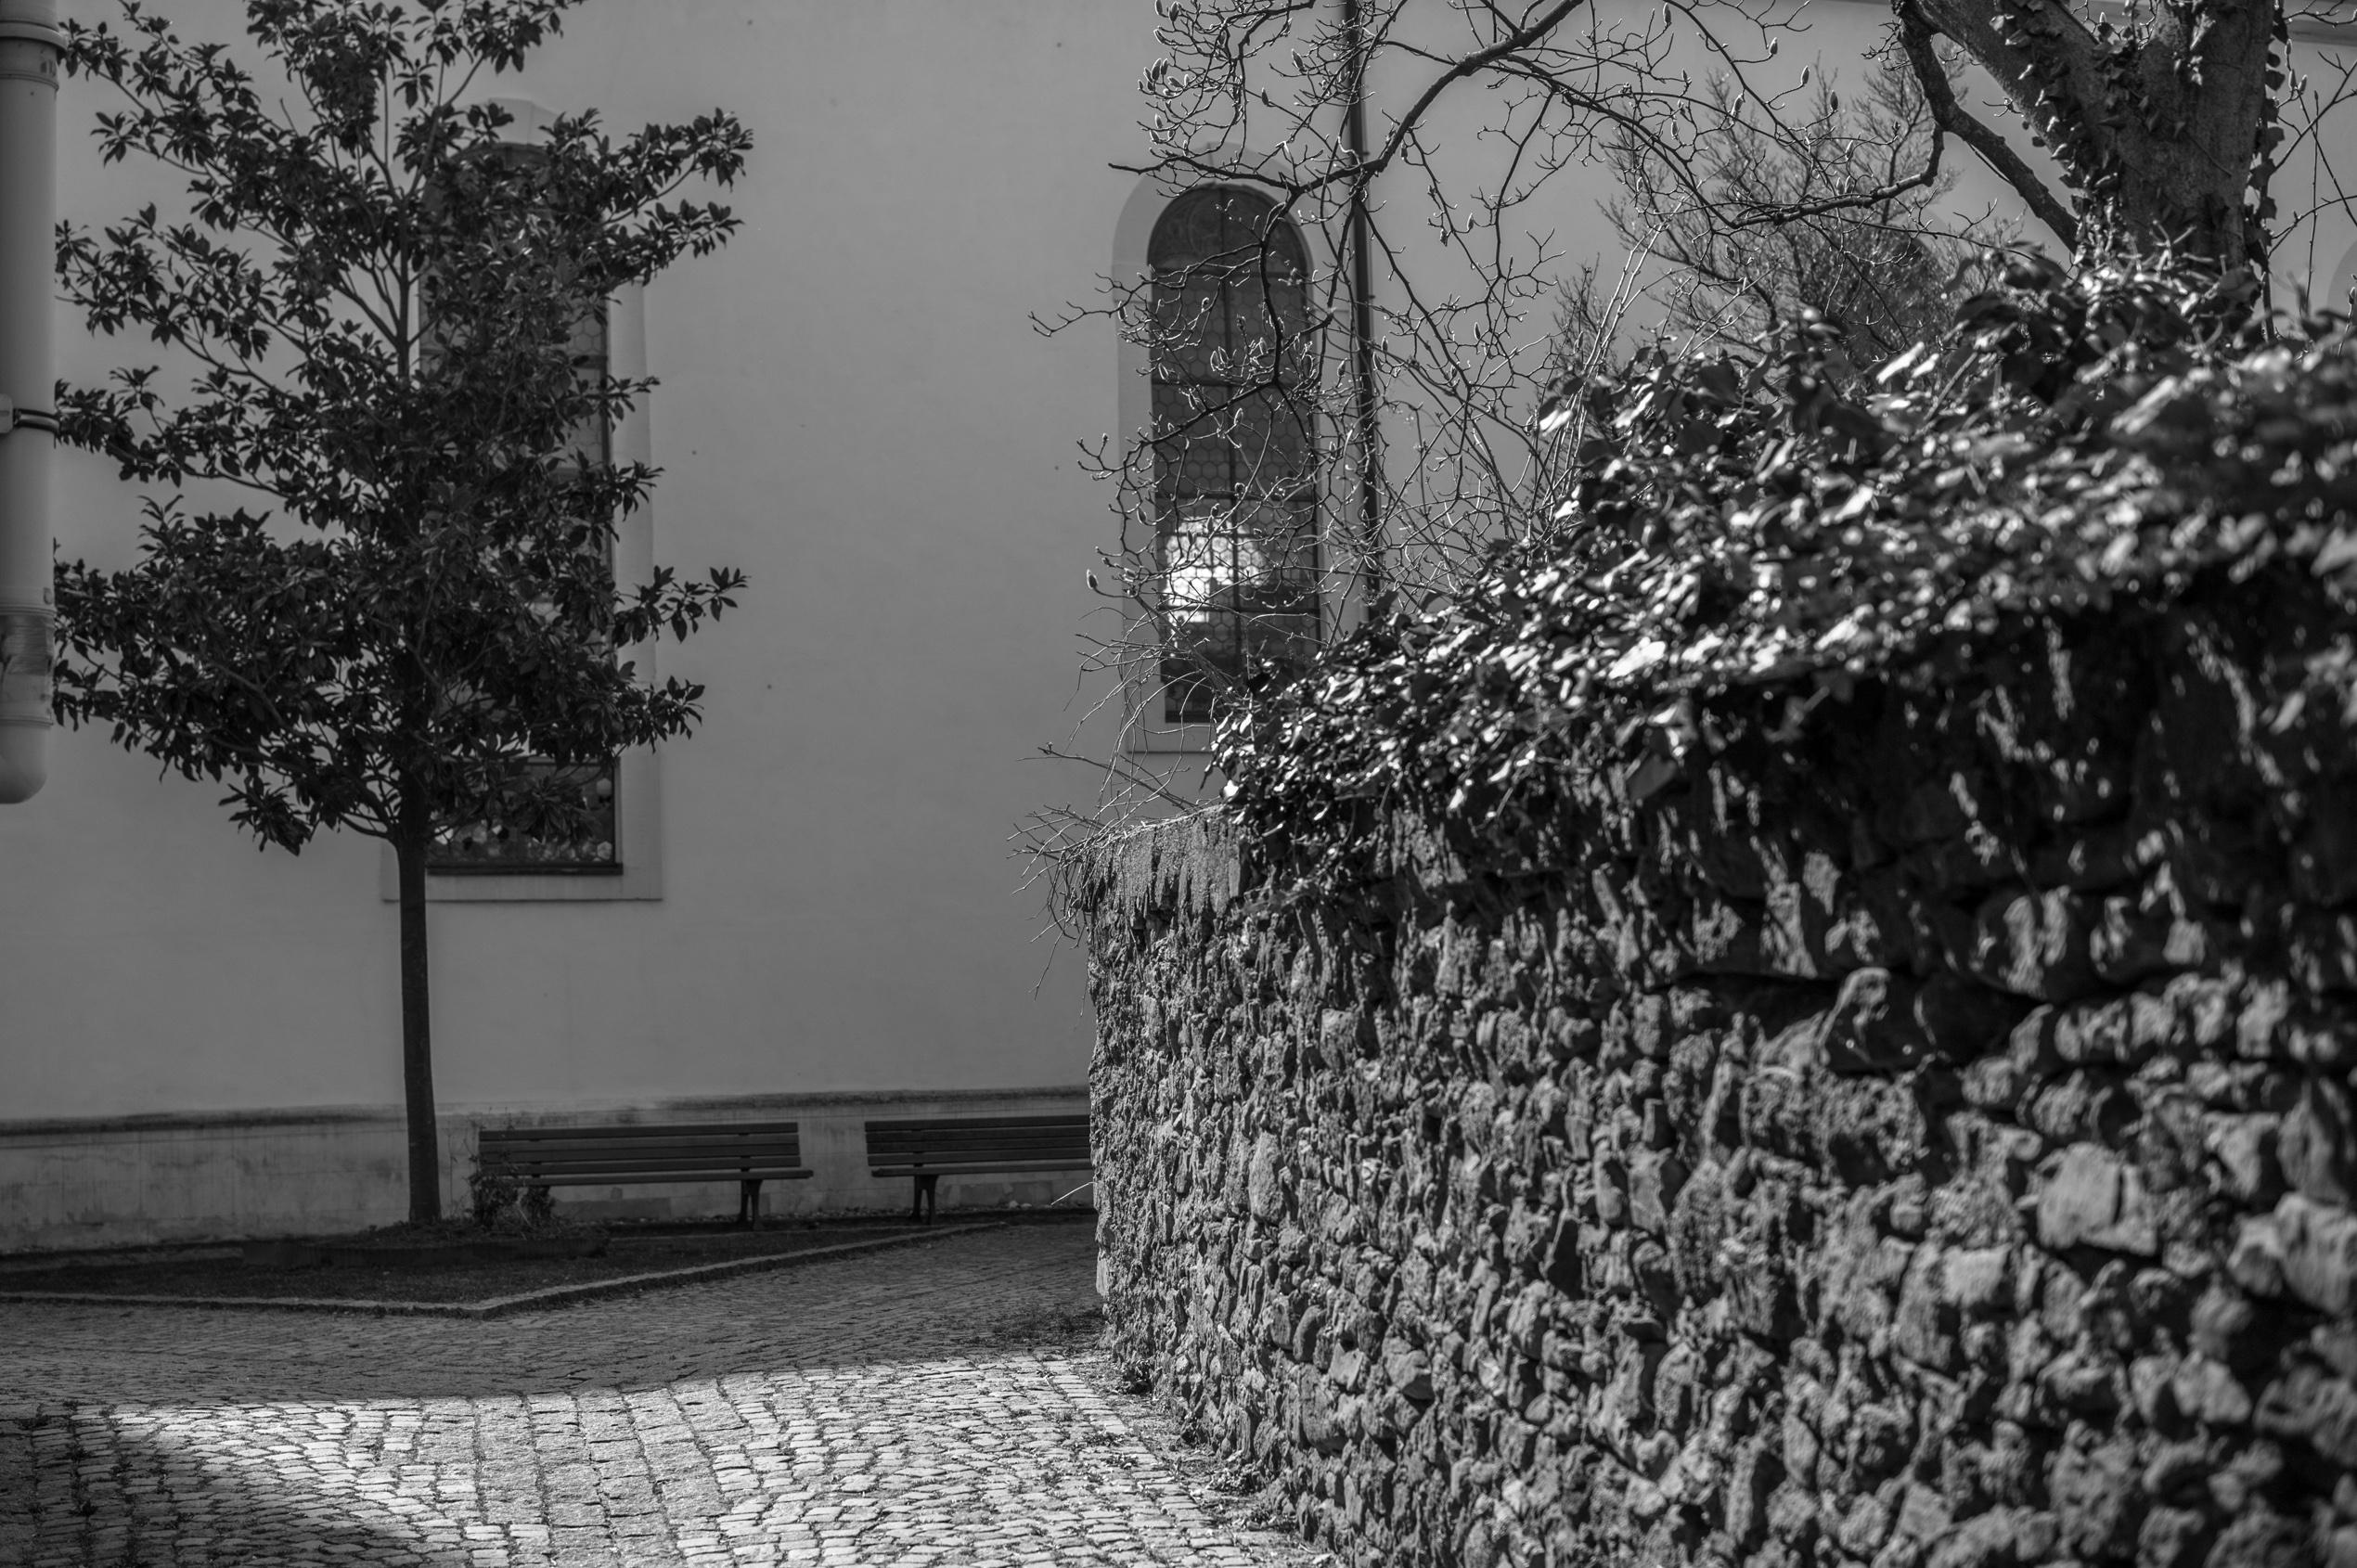 KirchenImDekanat-1001143 by .